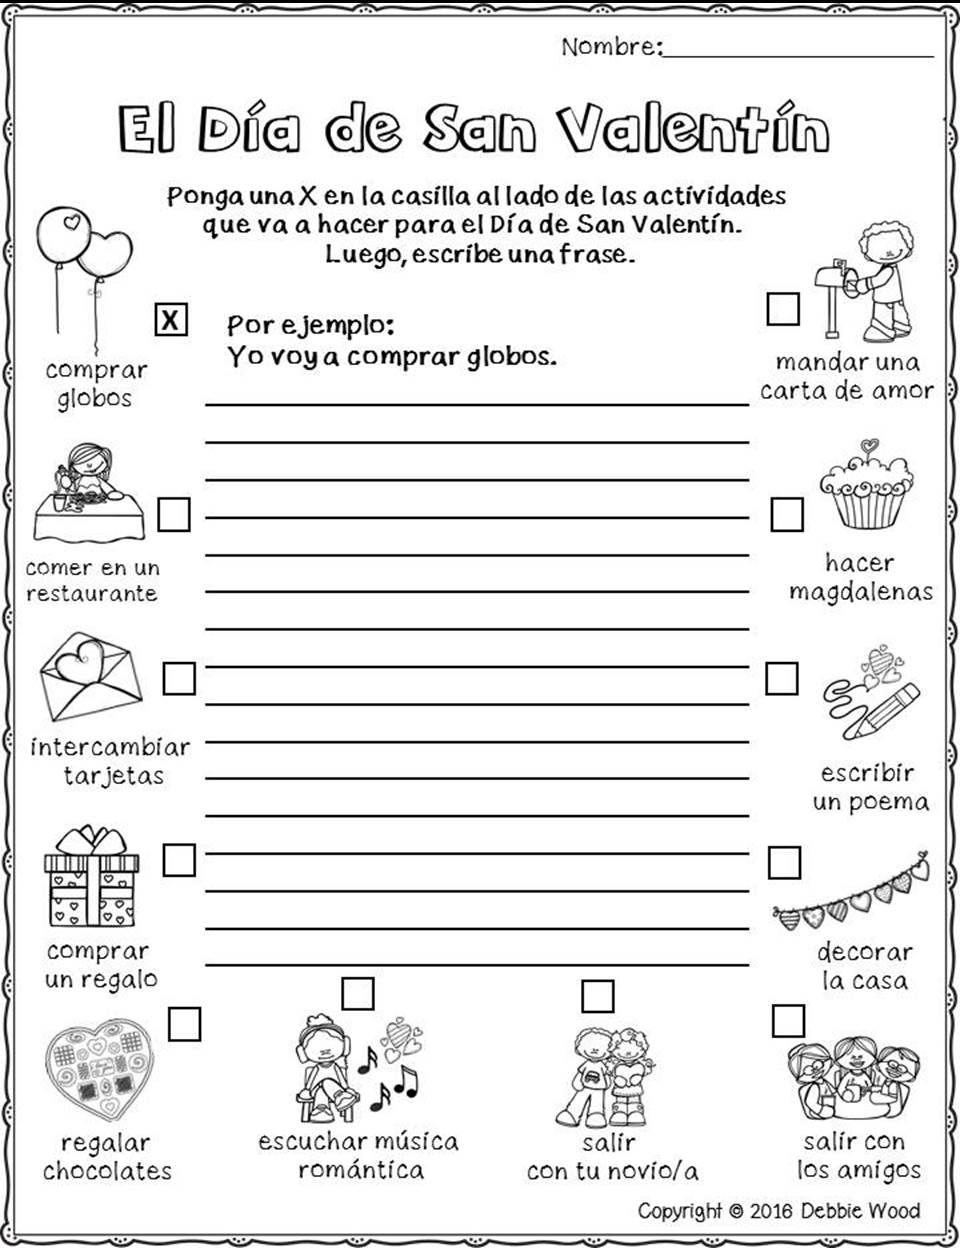 Worksheets High School Spanish Worksheets spanish valentines day activities actividades para febrero febrero